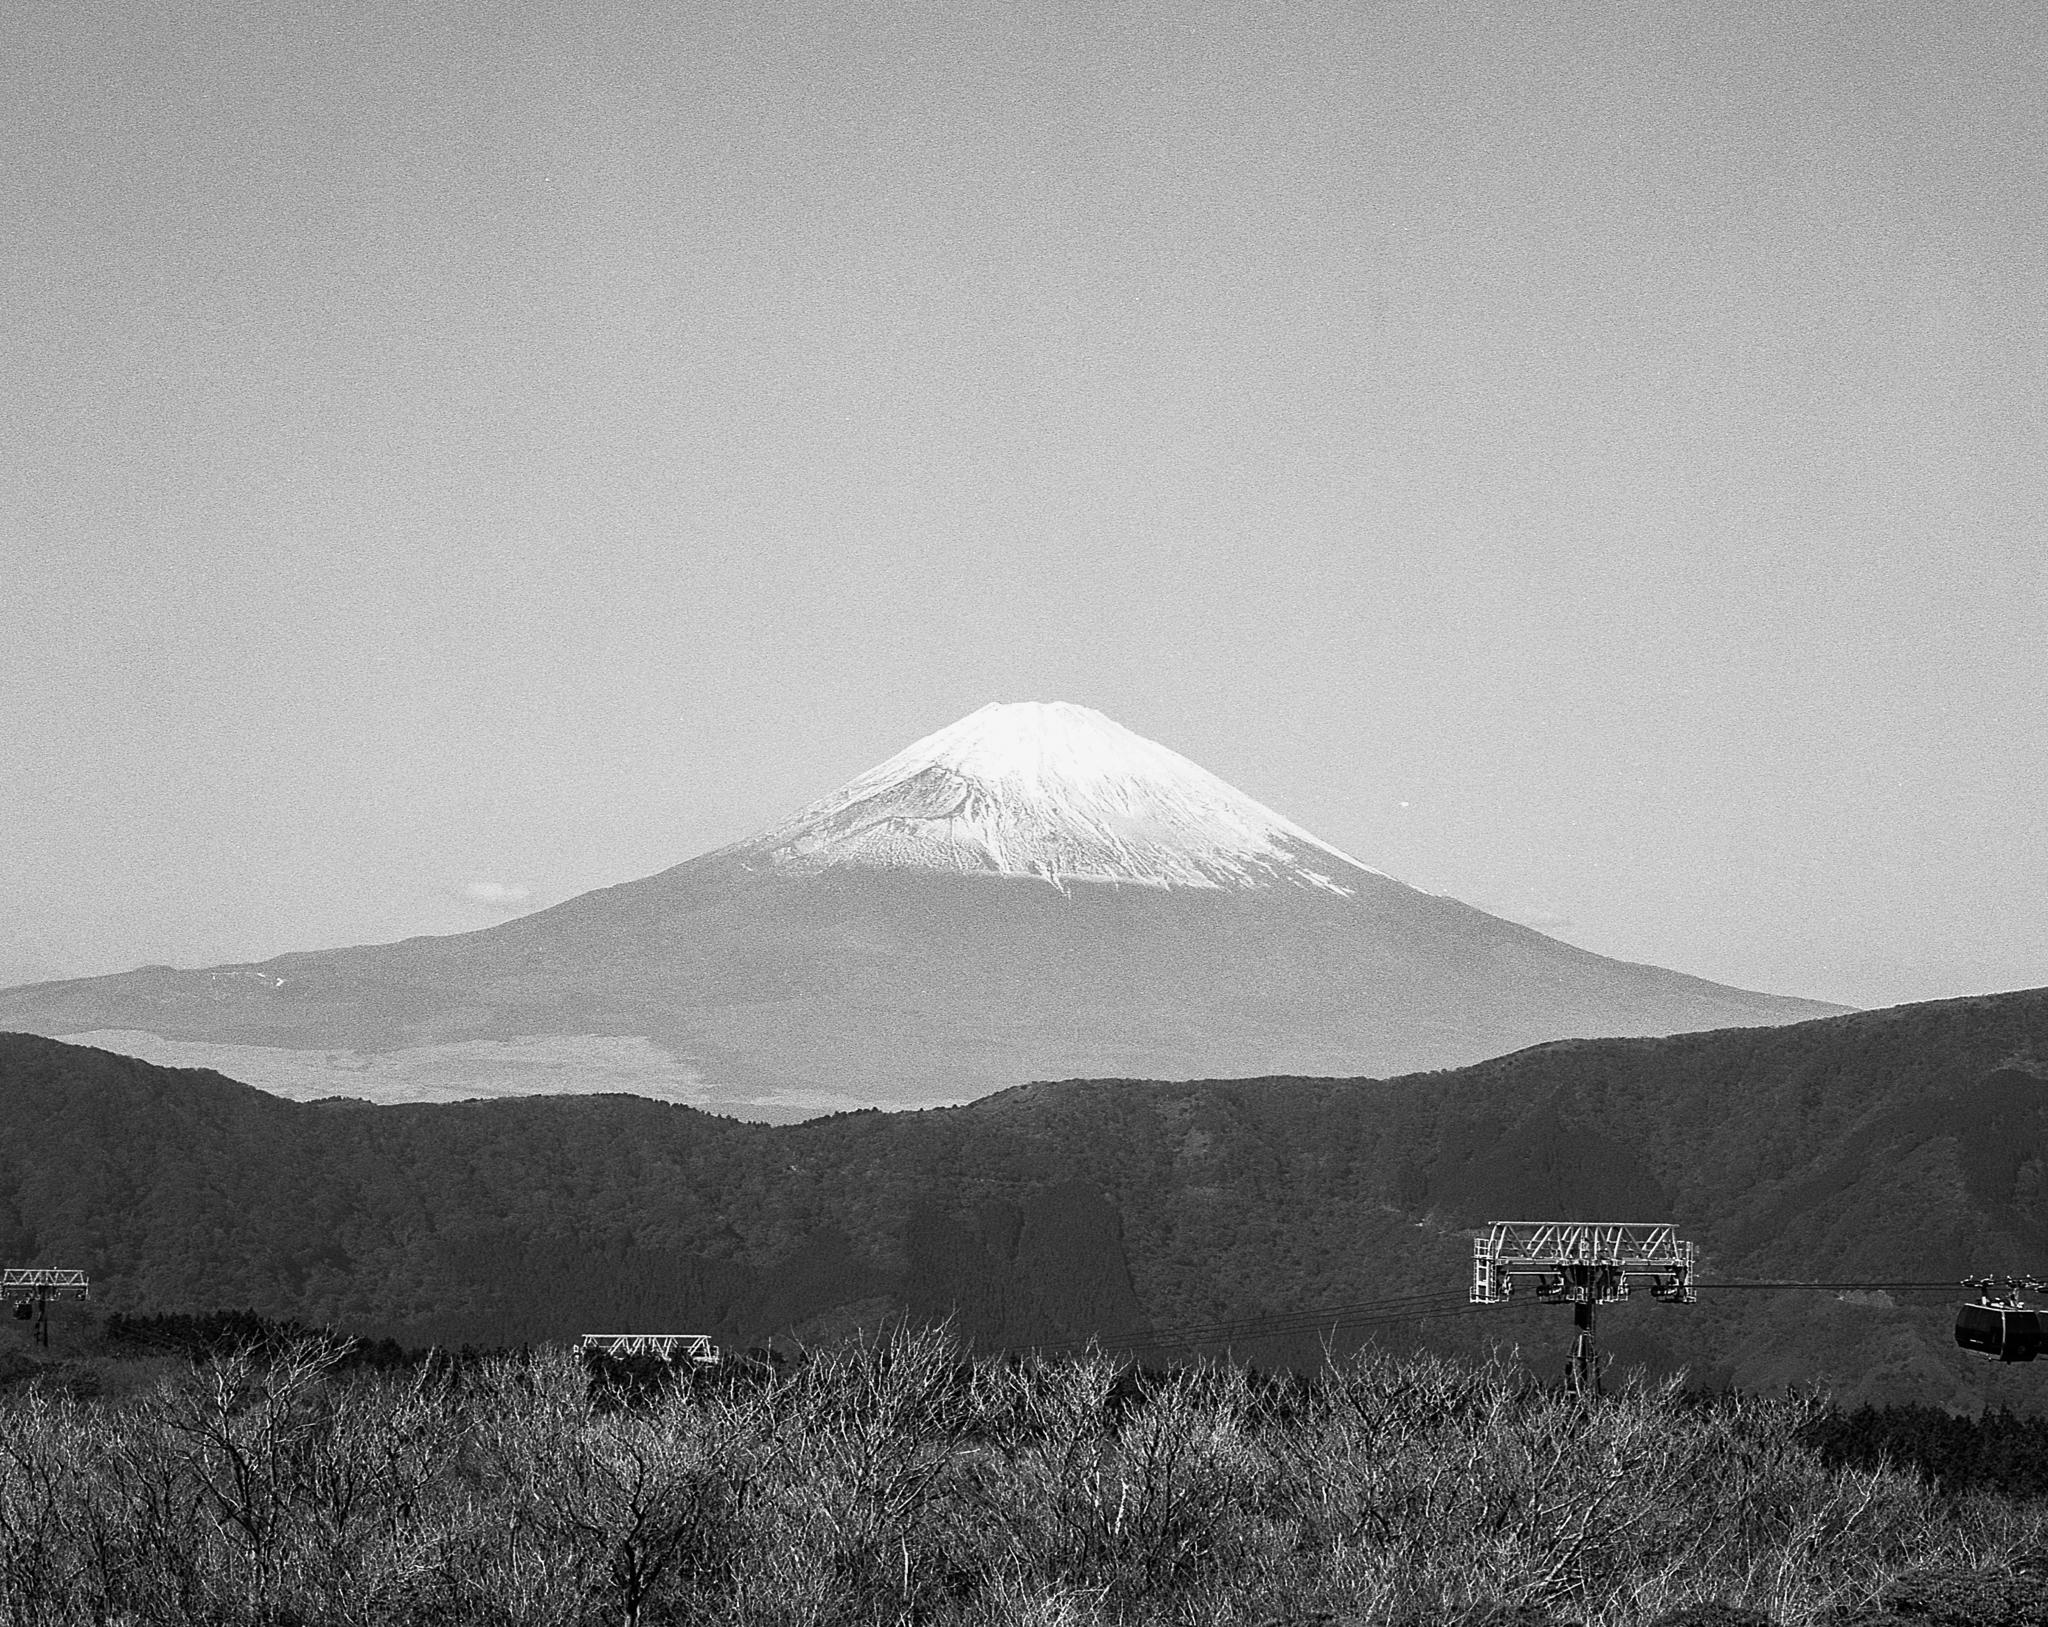 Mt. Fuji (Mamiya 7ii Ilford HP5+)